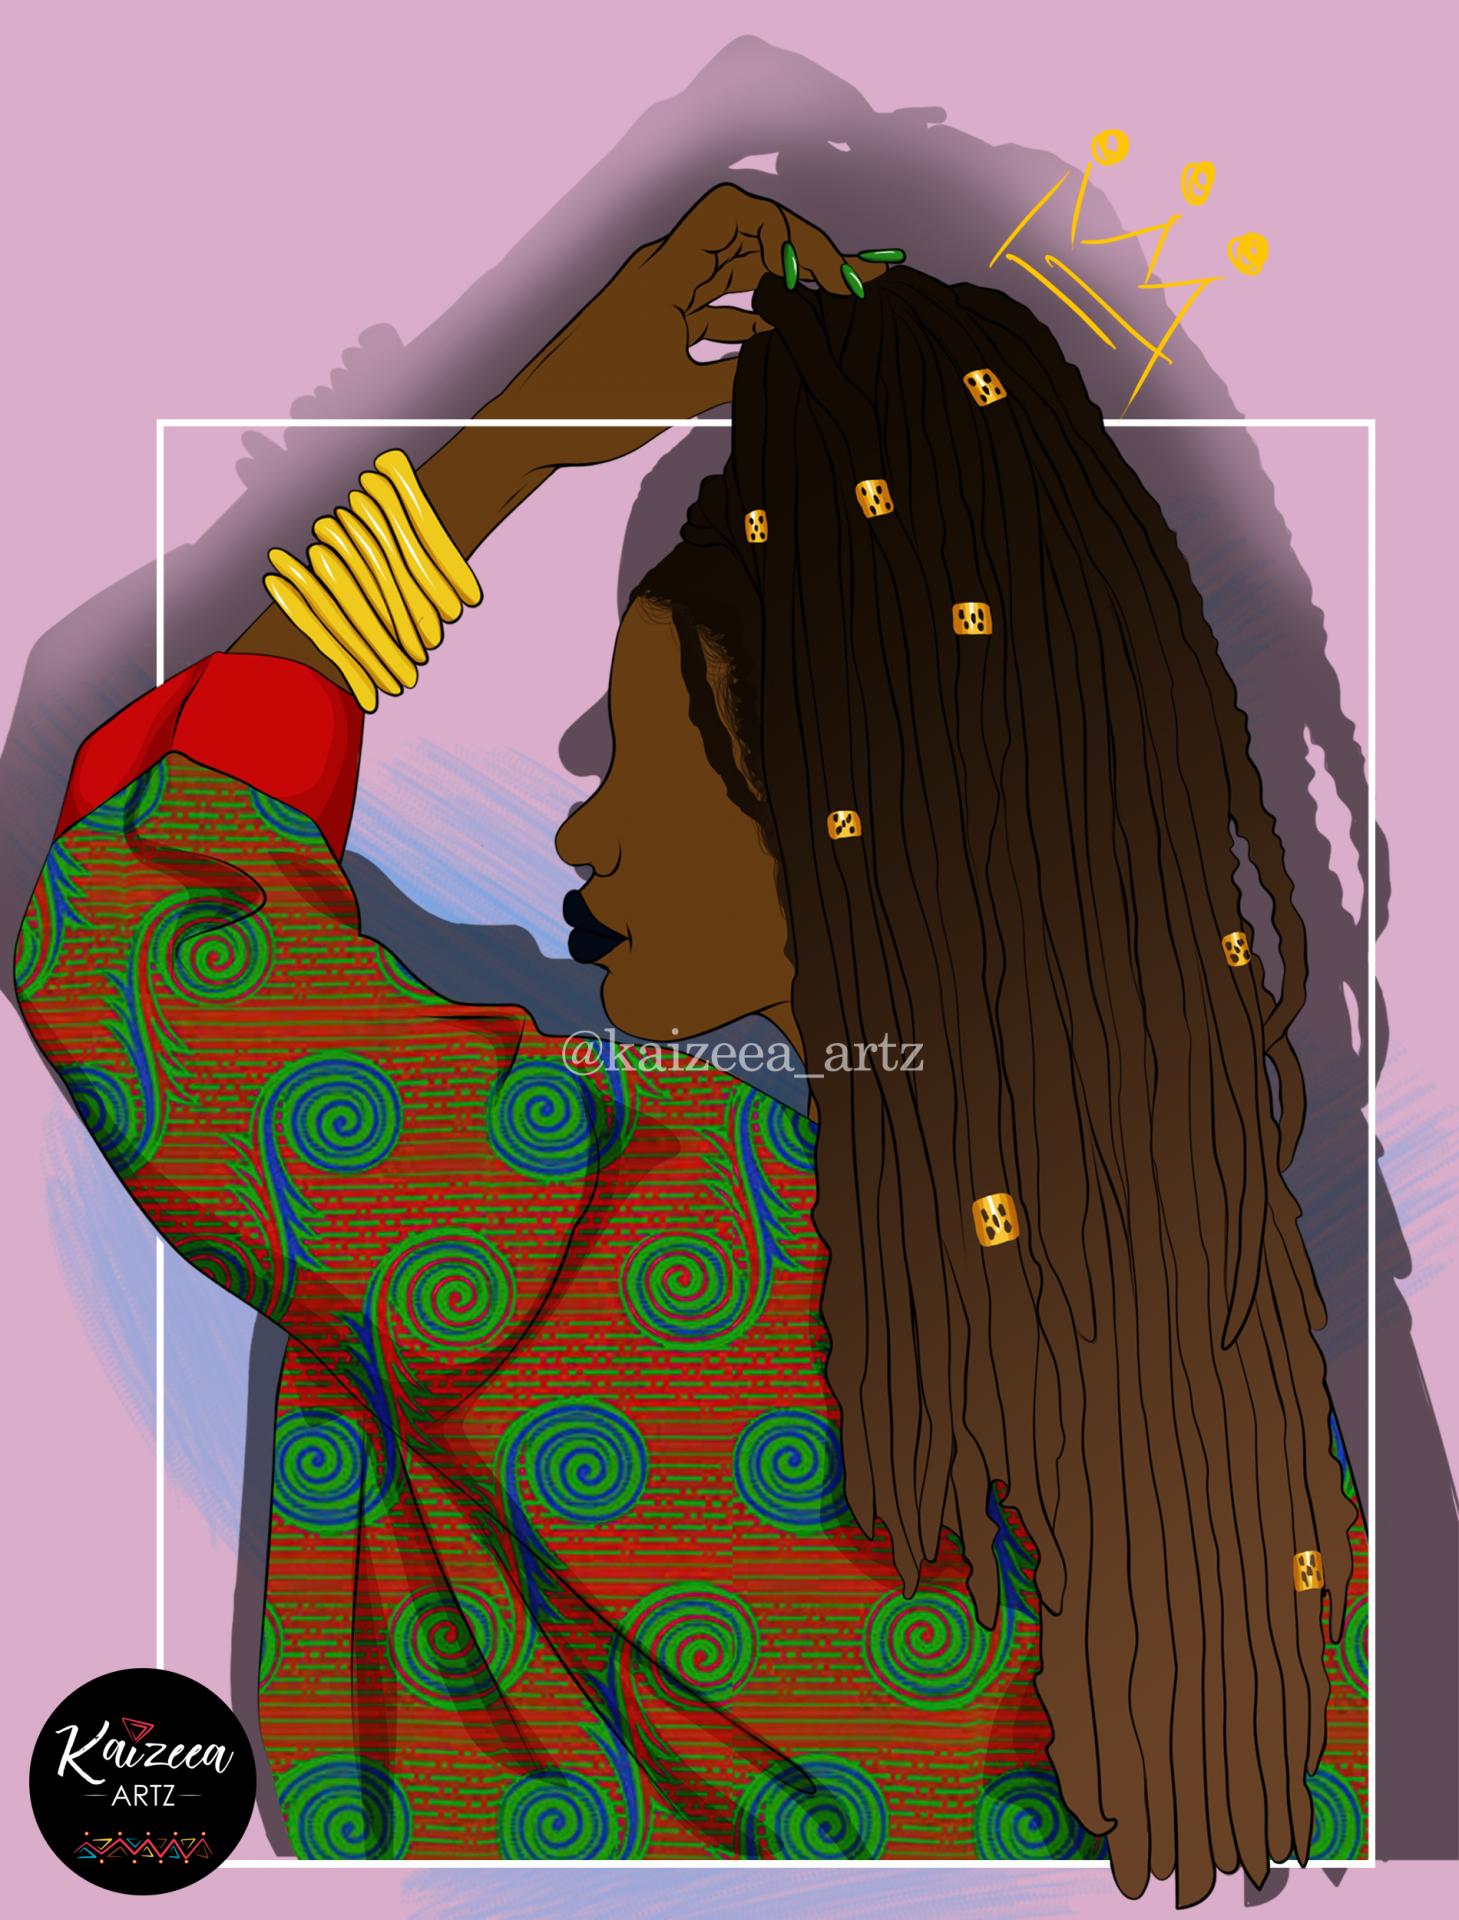 Kaizeea artz mauritius mauritian art mauritian artist digital art digital artist artist digital cartoon art vector bomber wax print african print merry xmas african cloth jacket pull red dread locs locsé rasta vecteur graphic design bracelet cuff jewelry handmade jewels accessories accessoire cheveux naturel manicure nail art green crown top art illustration drawing black artwork digital draw drawing while black art